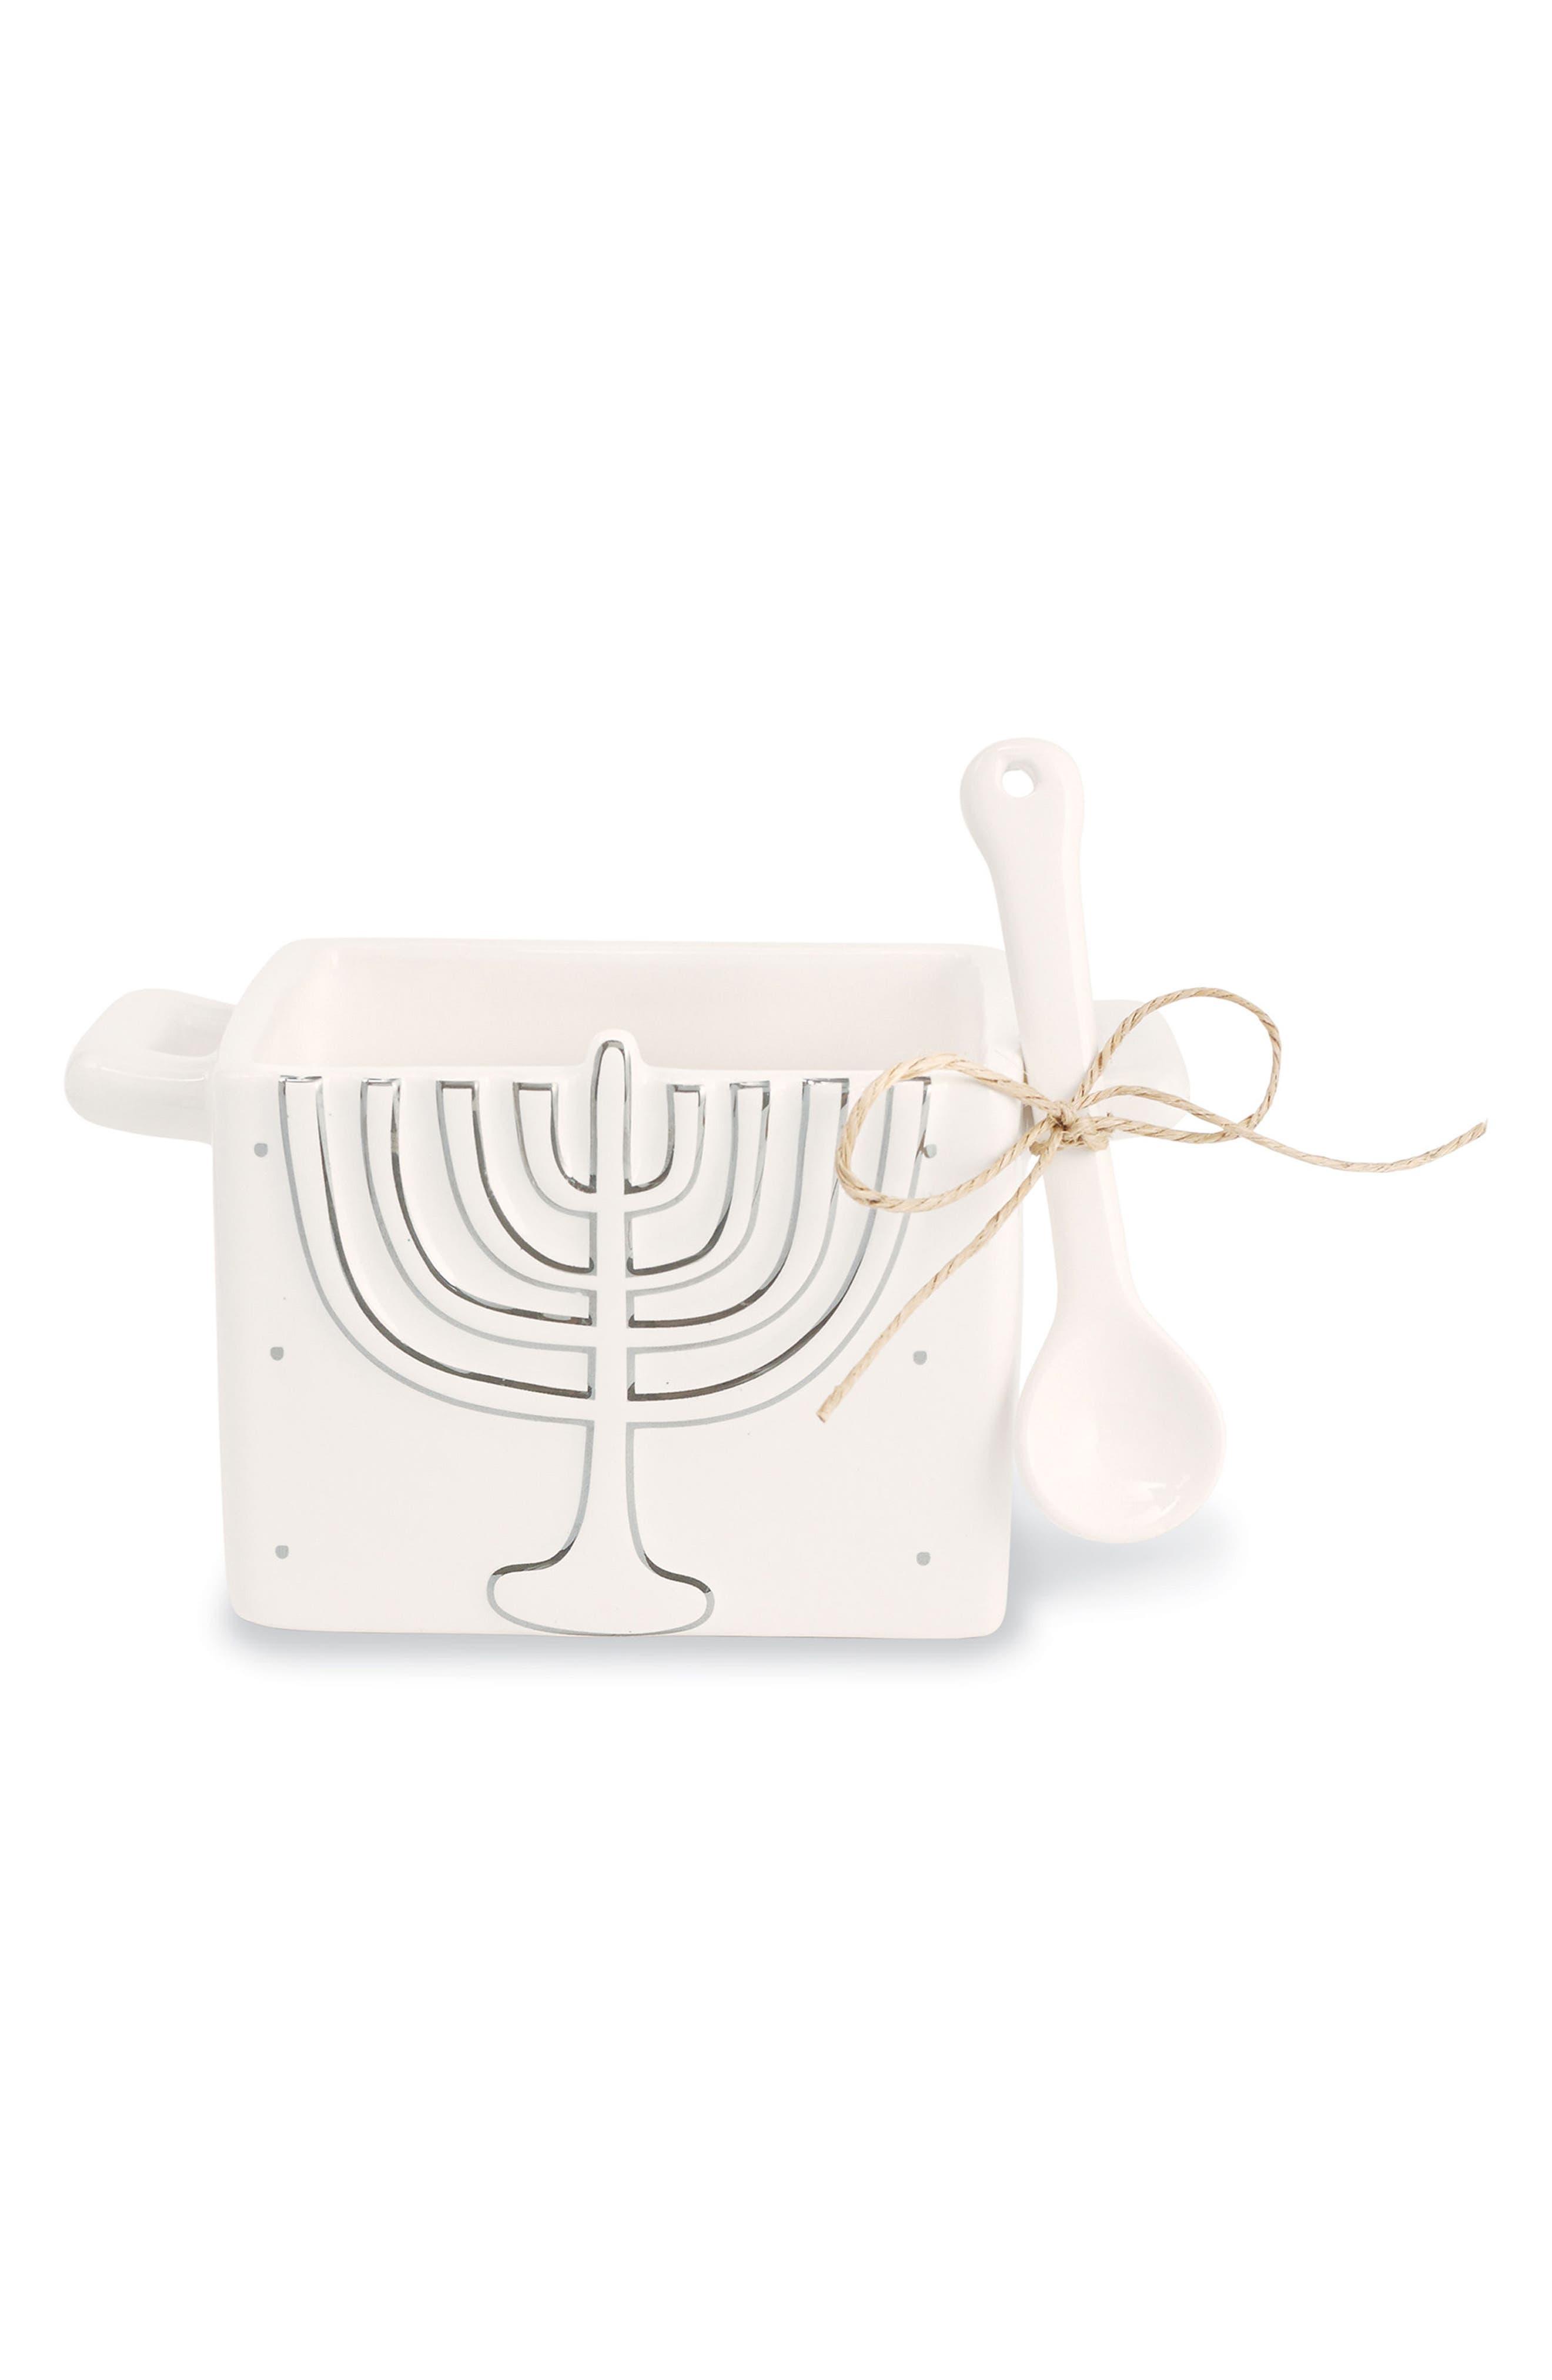 Menorah Hanukkah Candy Caddy & Spoon,                         Main,                         color, 100